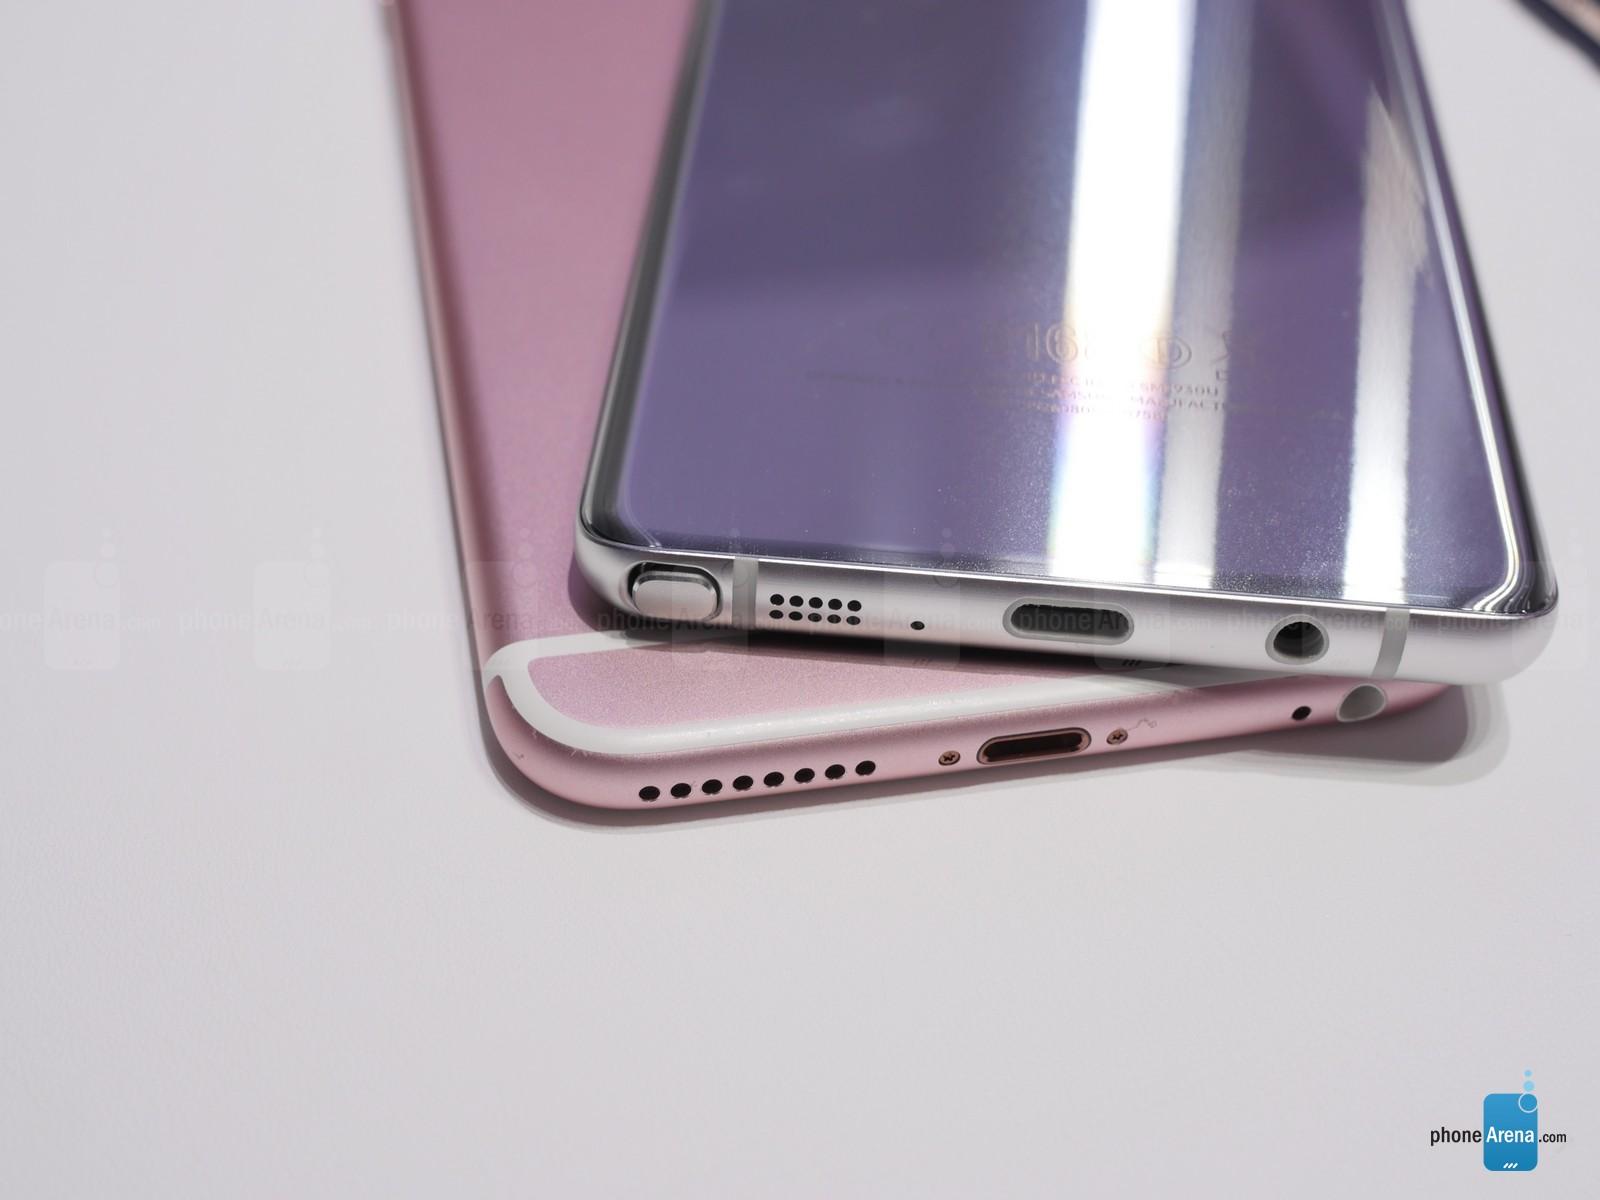 Samsung-Galaxy-Note-7-vs-Appfgfgle-iPhone-6s-Plus